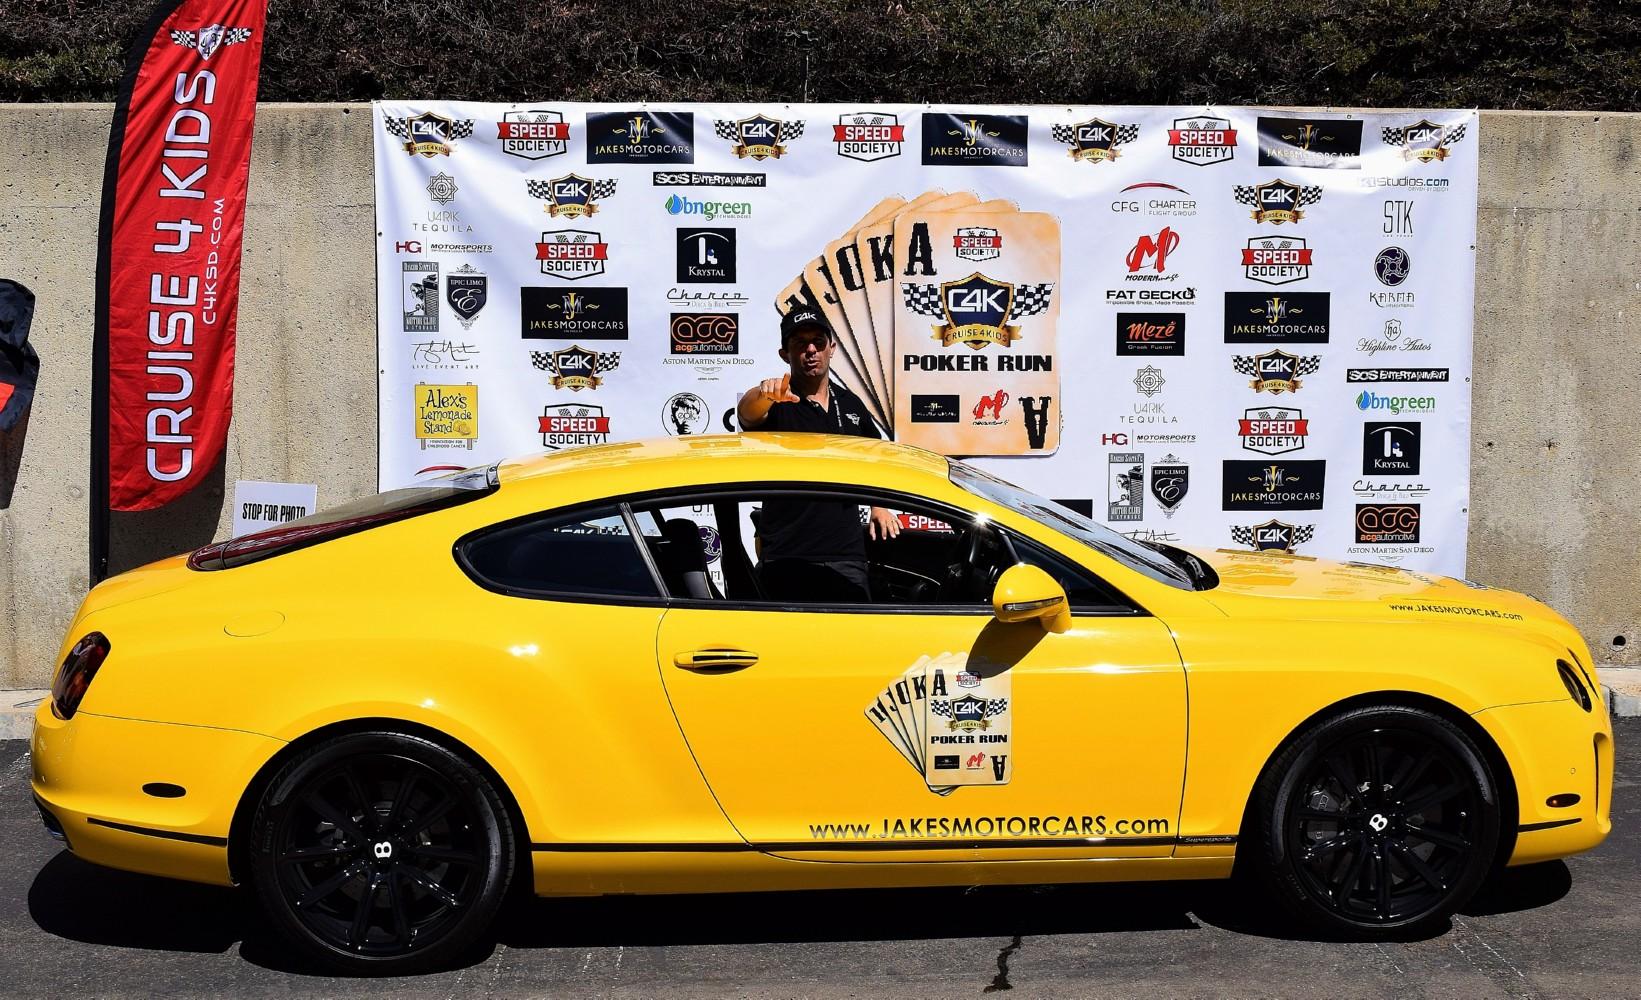 Poker Run 2017 Banner Photos - 1.jpg